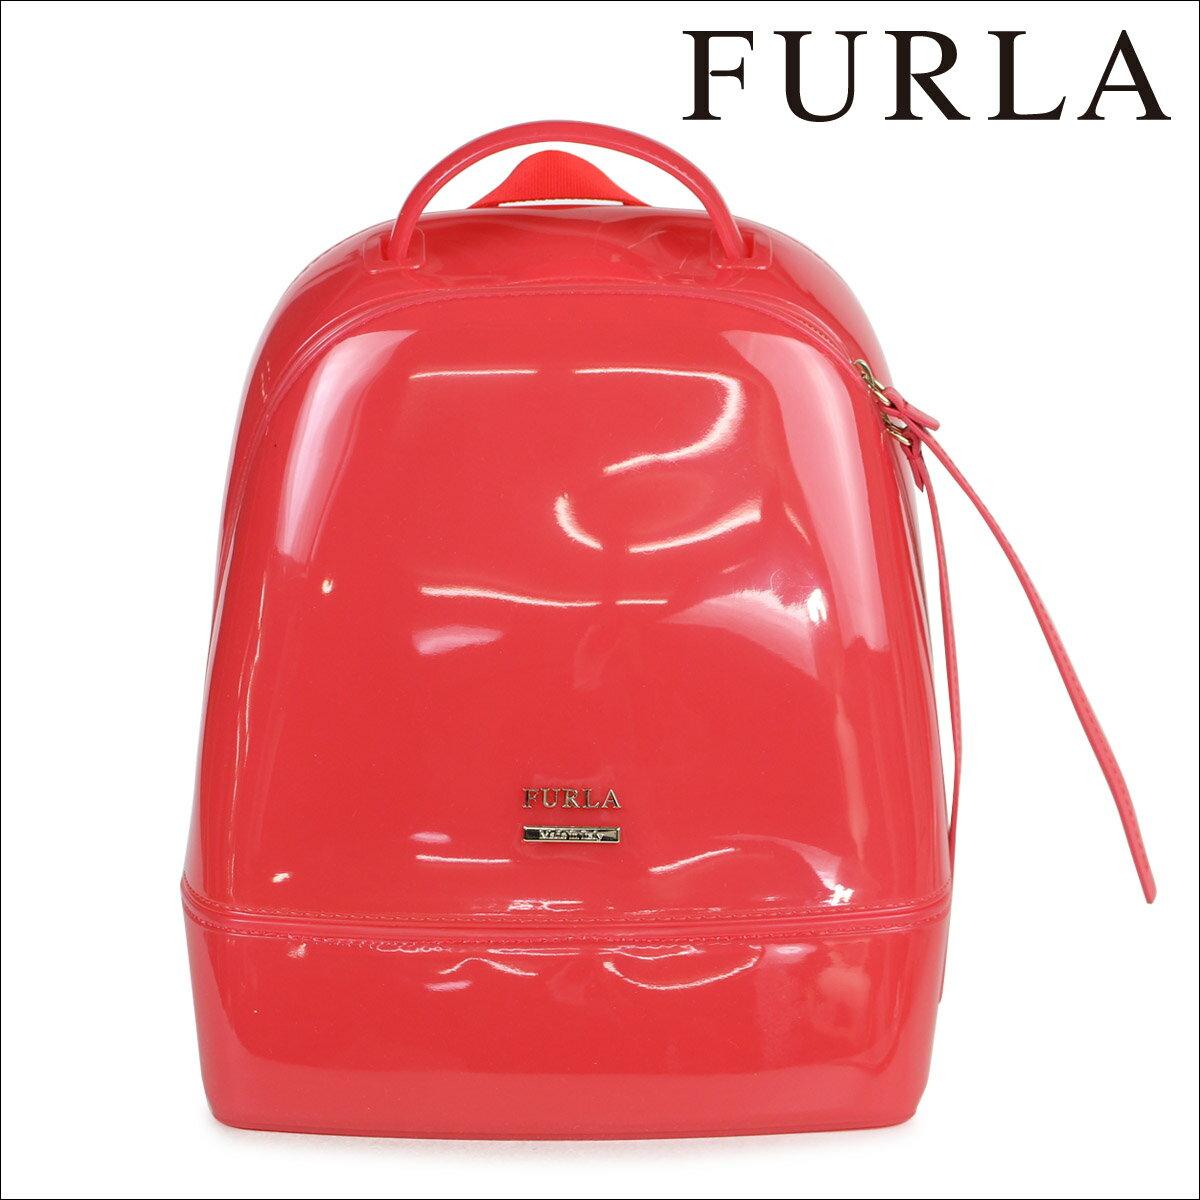 FURLA CANDY S BACK PACK RPSA フルラ バッグ リュック バックパック レディース ピンク 885218 [12/26 新入荷]